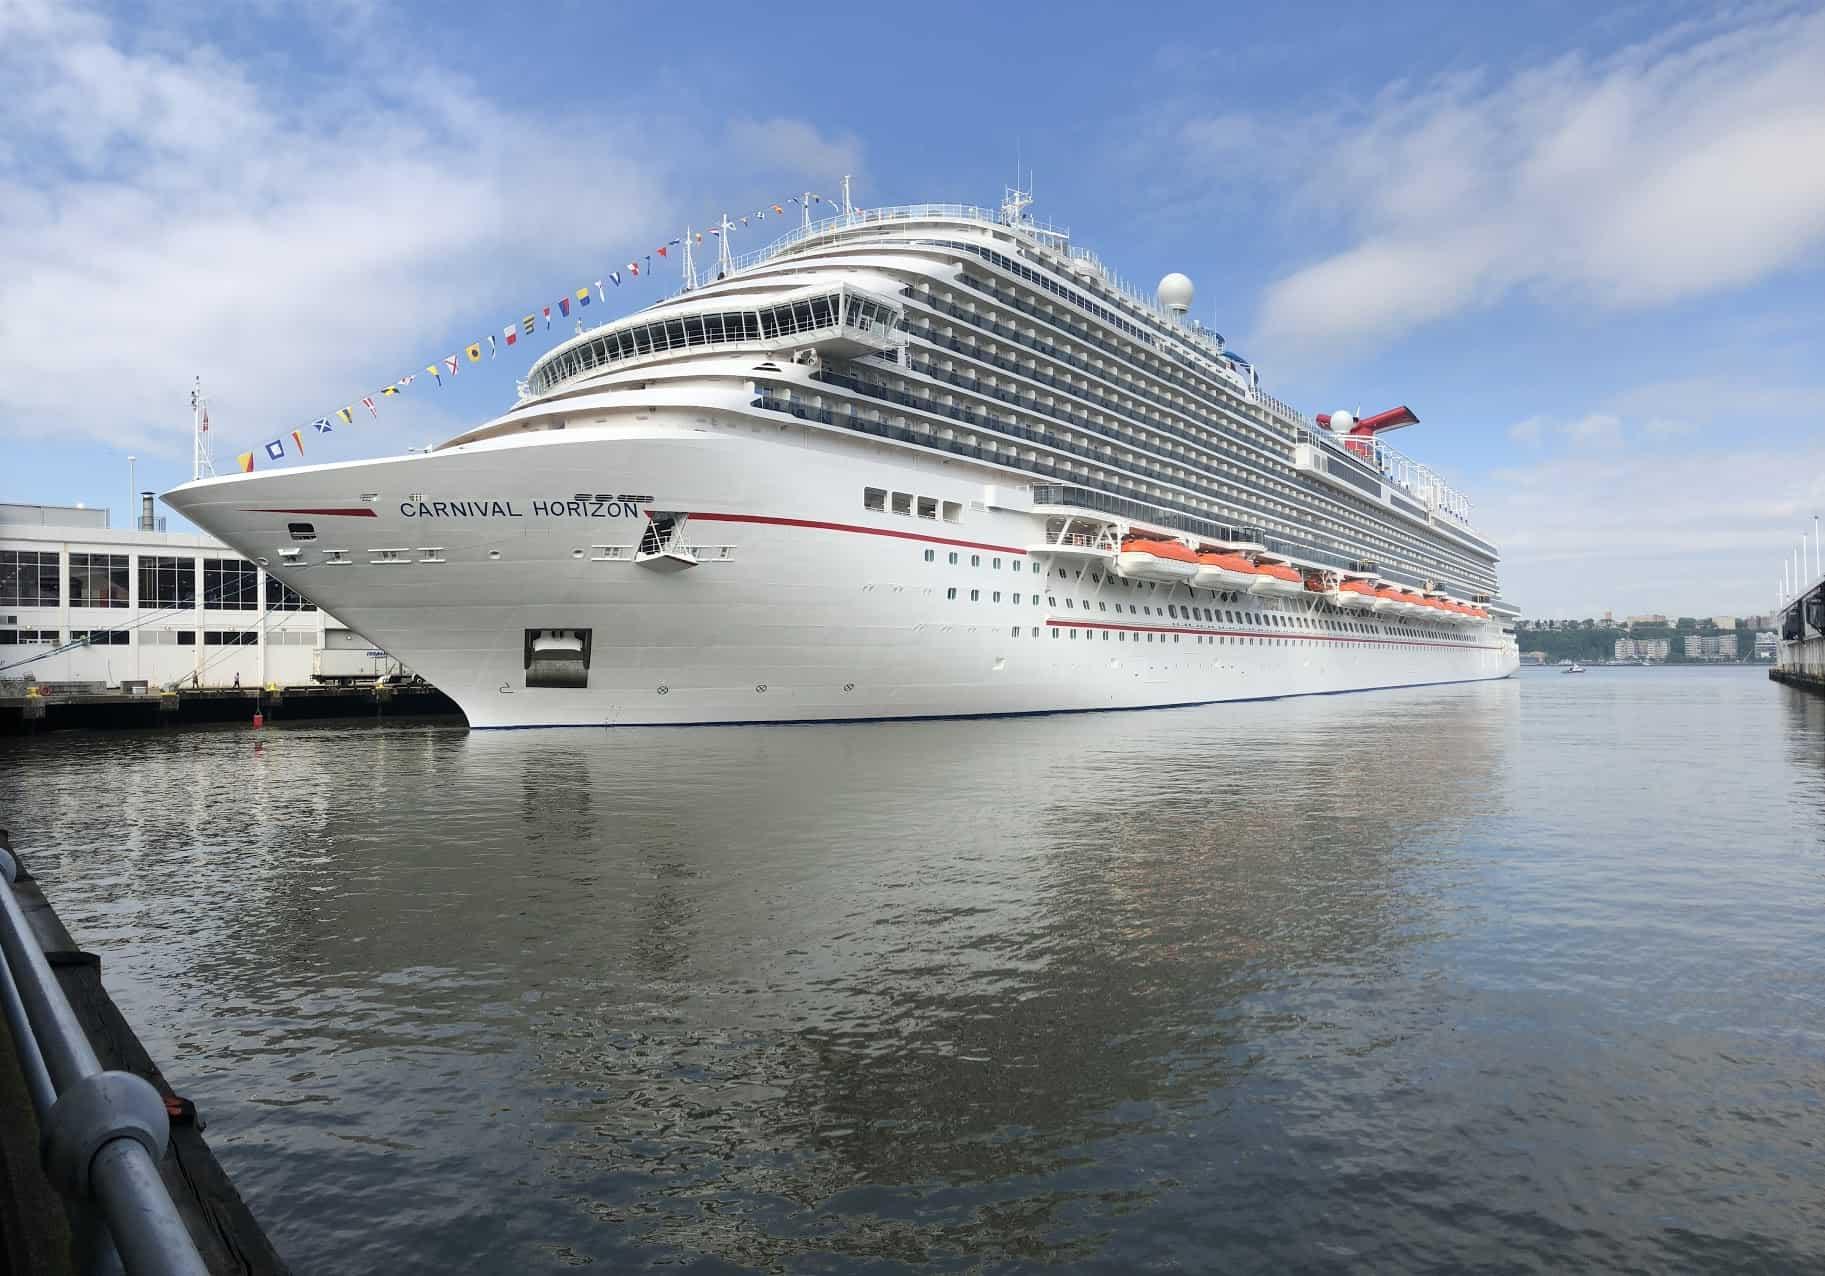 carnival horizon docked